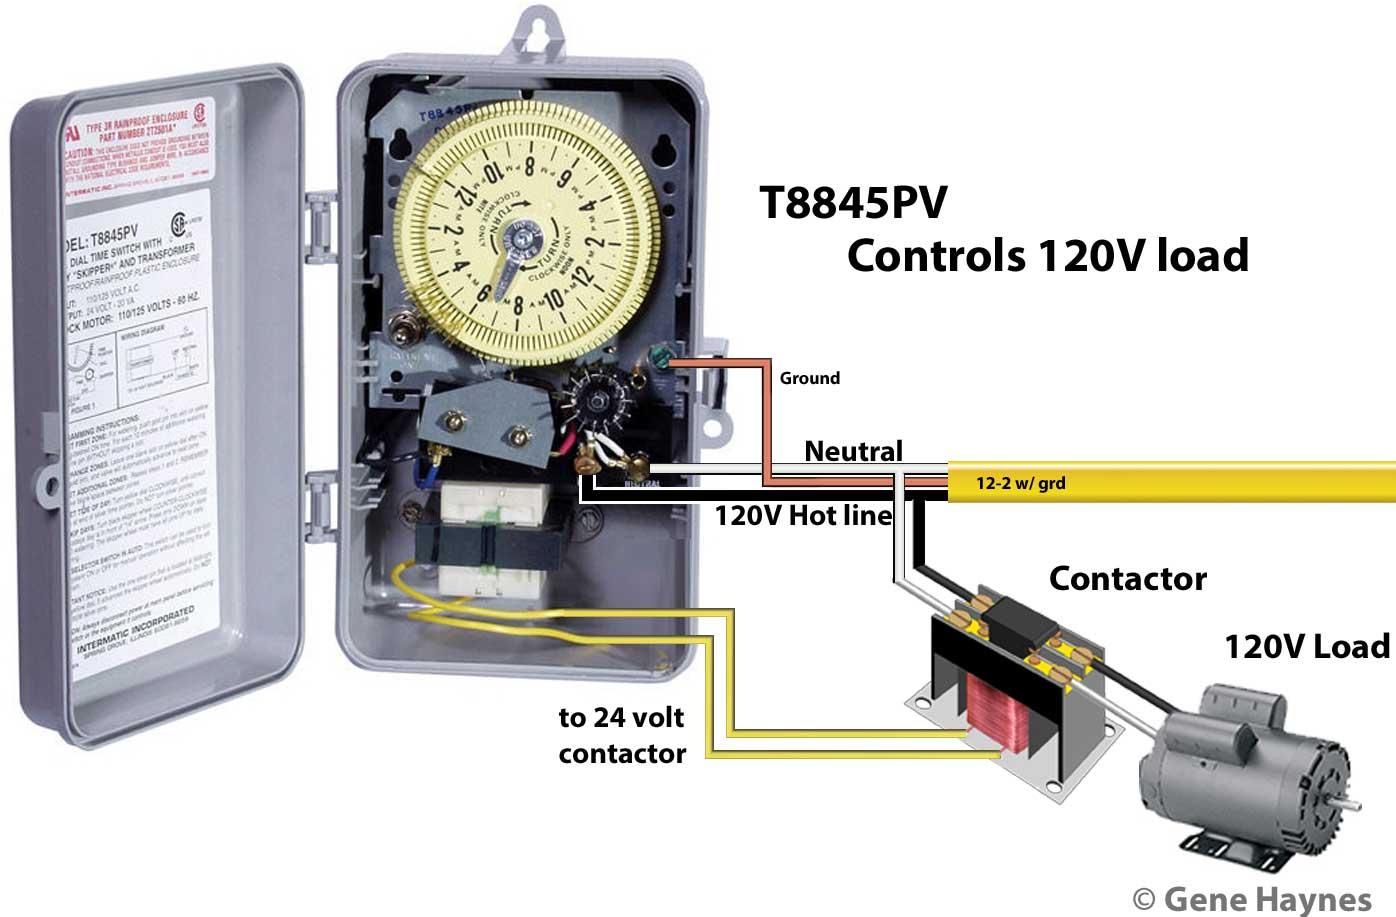 Fh 3223 Intermatic Transformer Wiring Diagram Get Free Image About Wiring Free Diagram